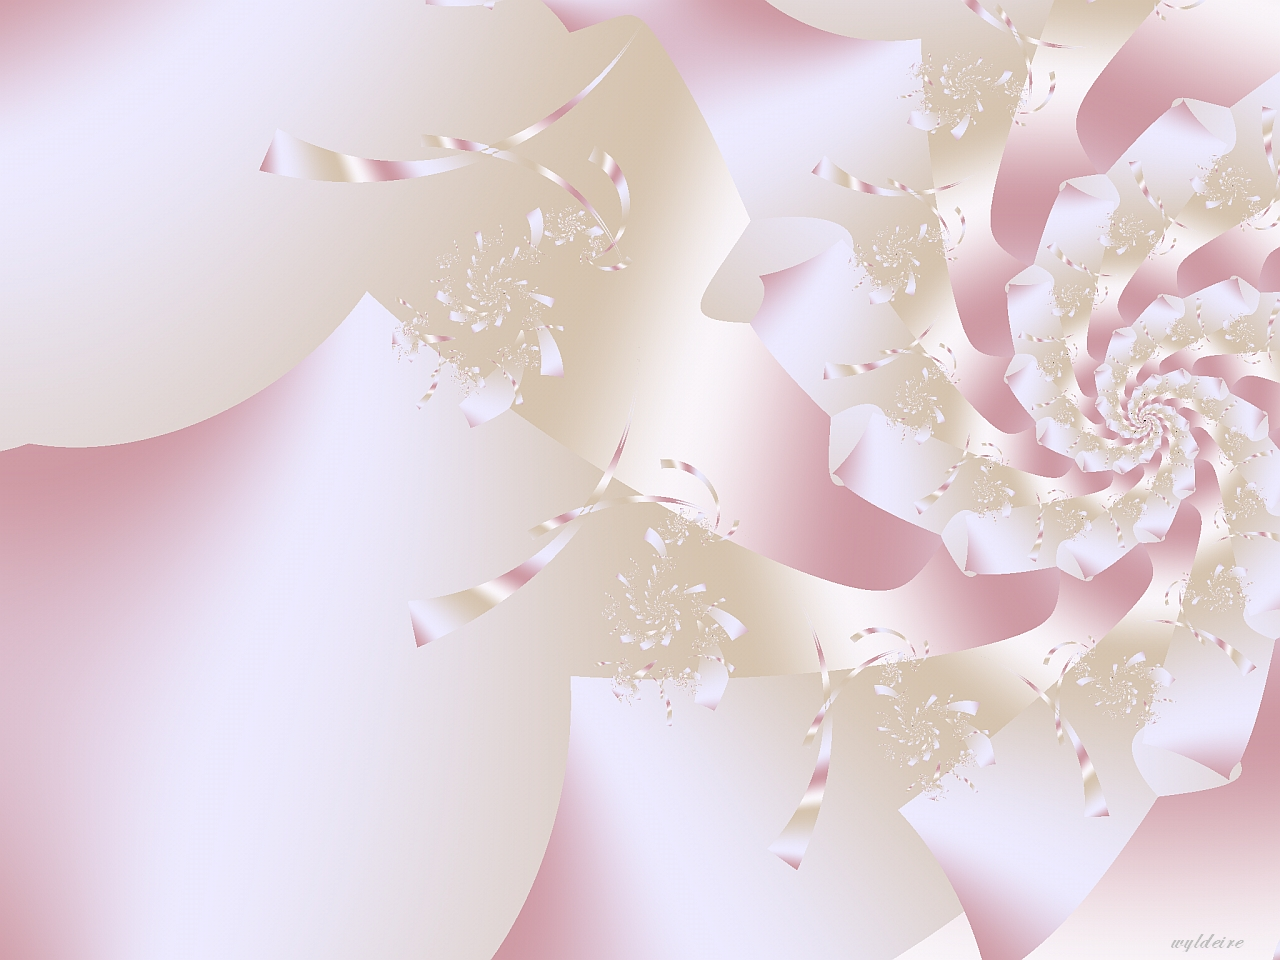 Pretty in Pink Wallpaper by wyldeire 1280x960